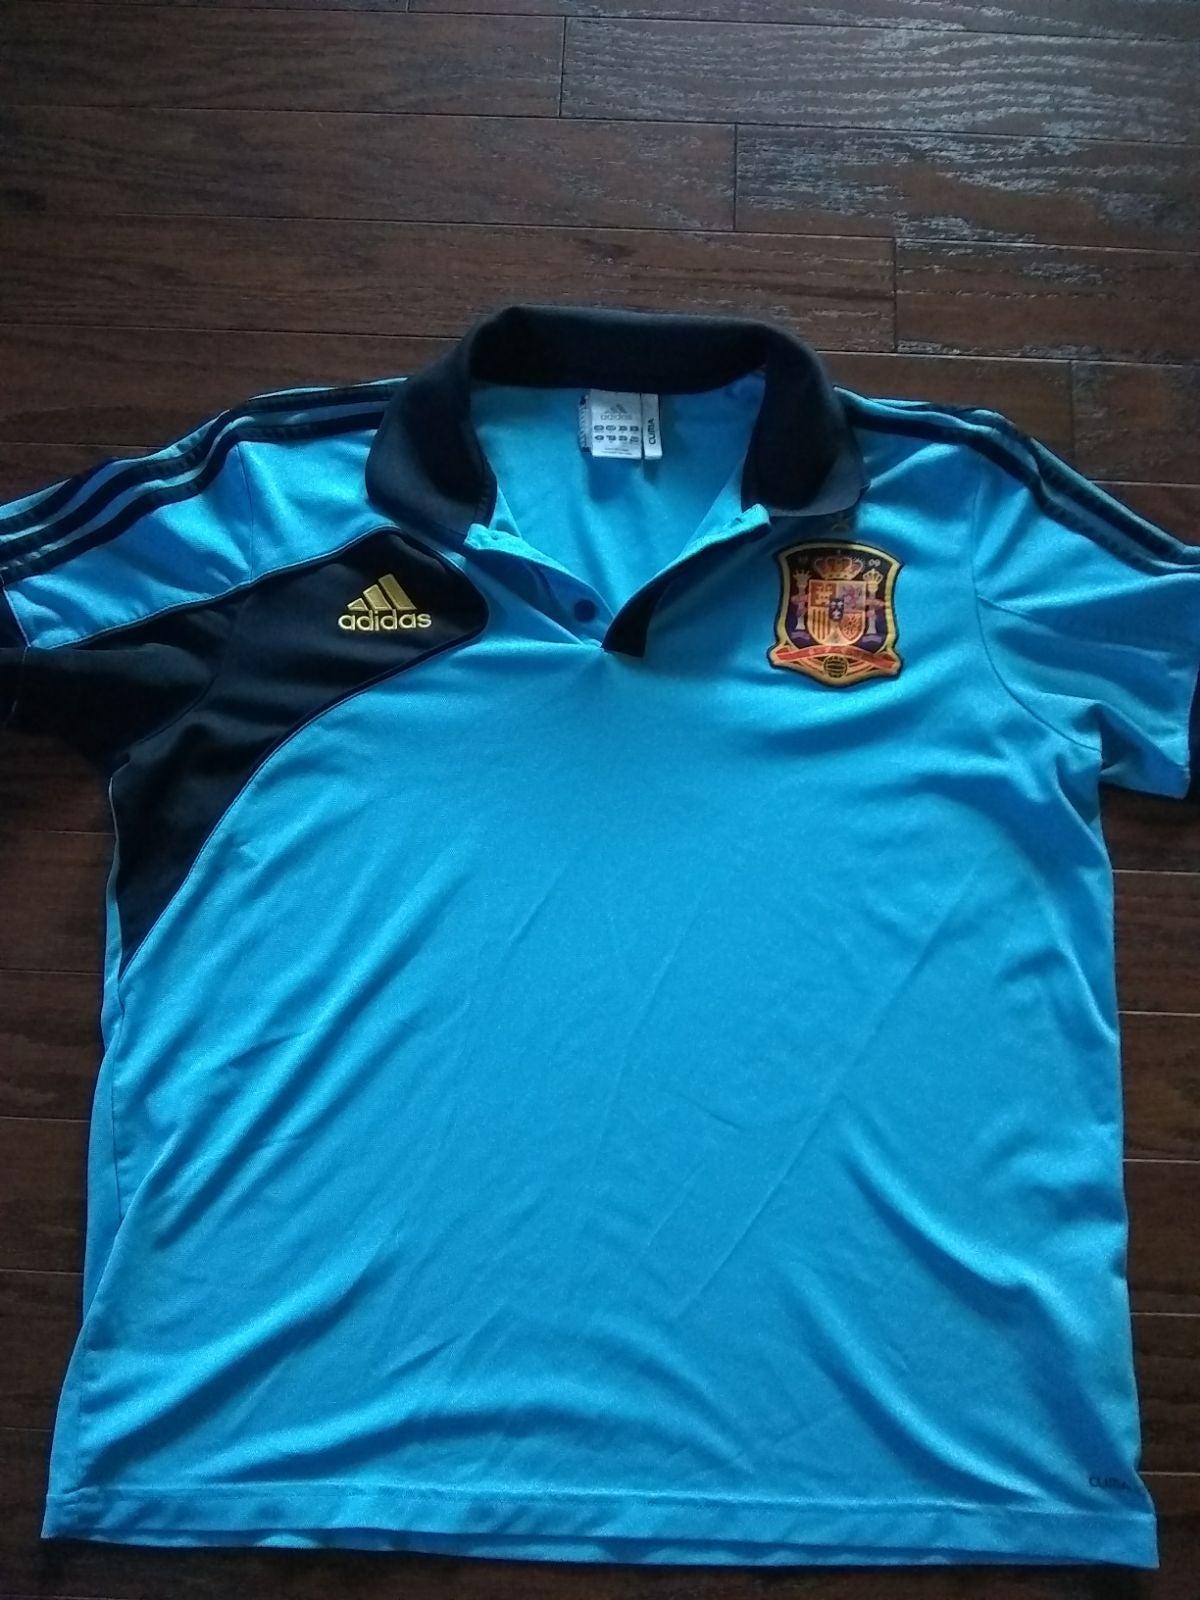 Spanish National Team training jersey